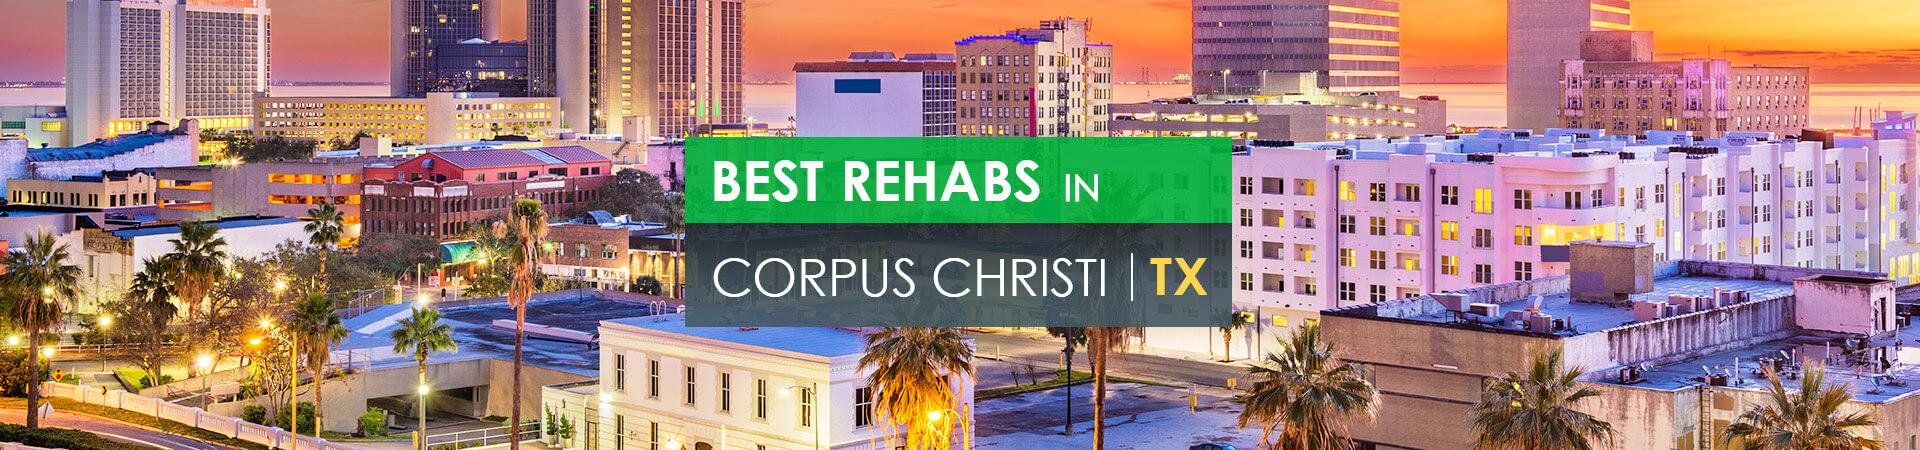 Best rehabs in Corpus Christi, TX